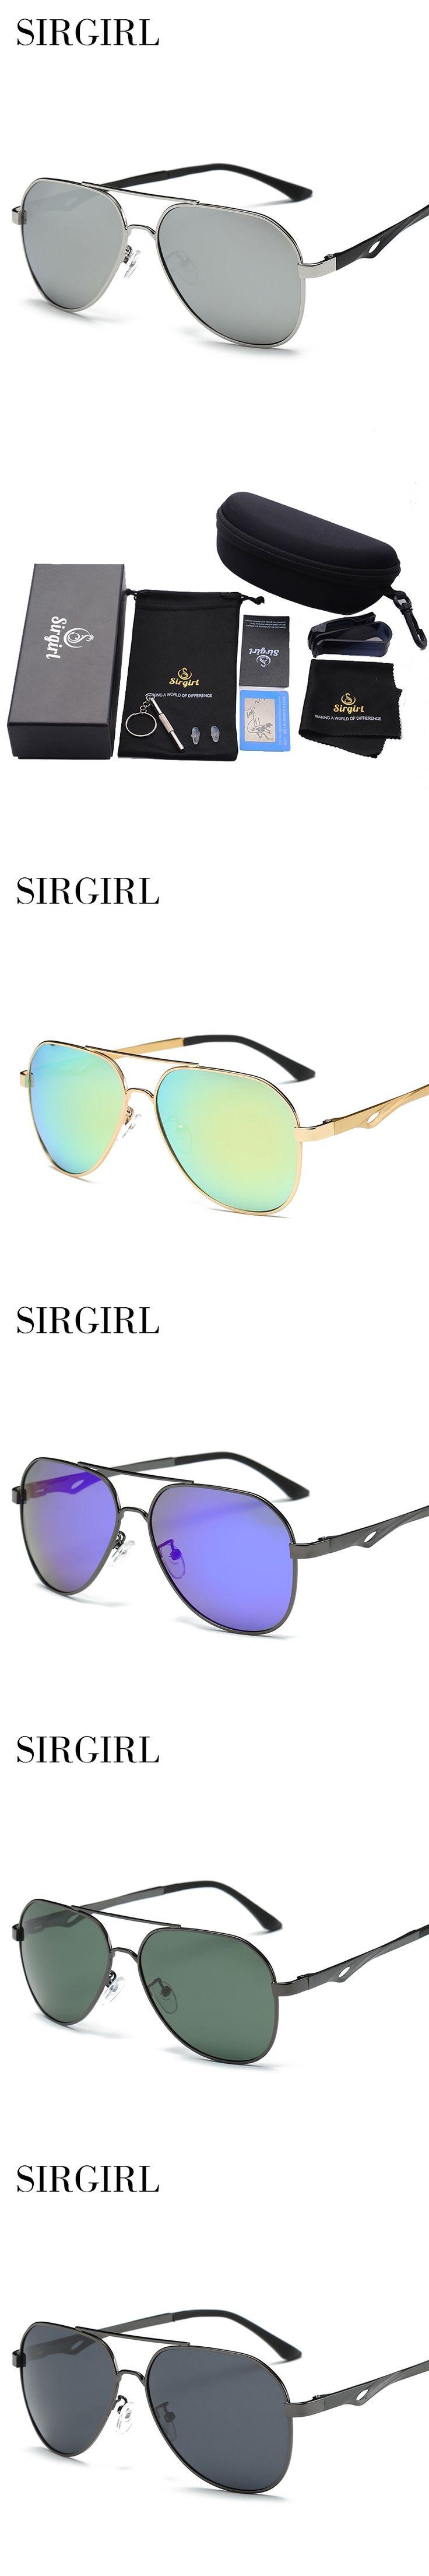 2017 HD Sirgirl Men Brand Logo Luxury Driving Pilot Polarized Sunglasses Sun Glasses Aluminum Magnesium Alloy oculos de sol male